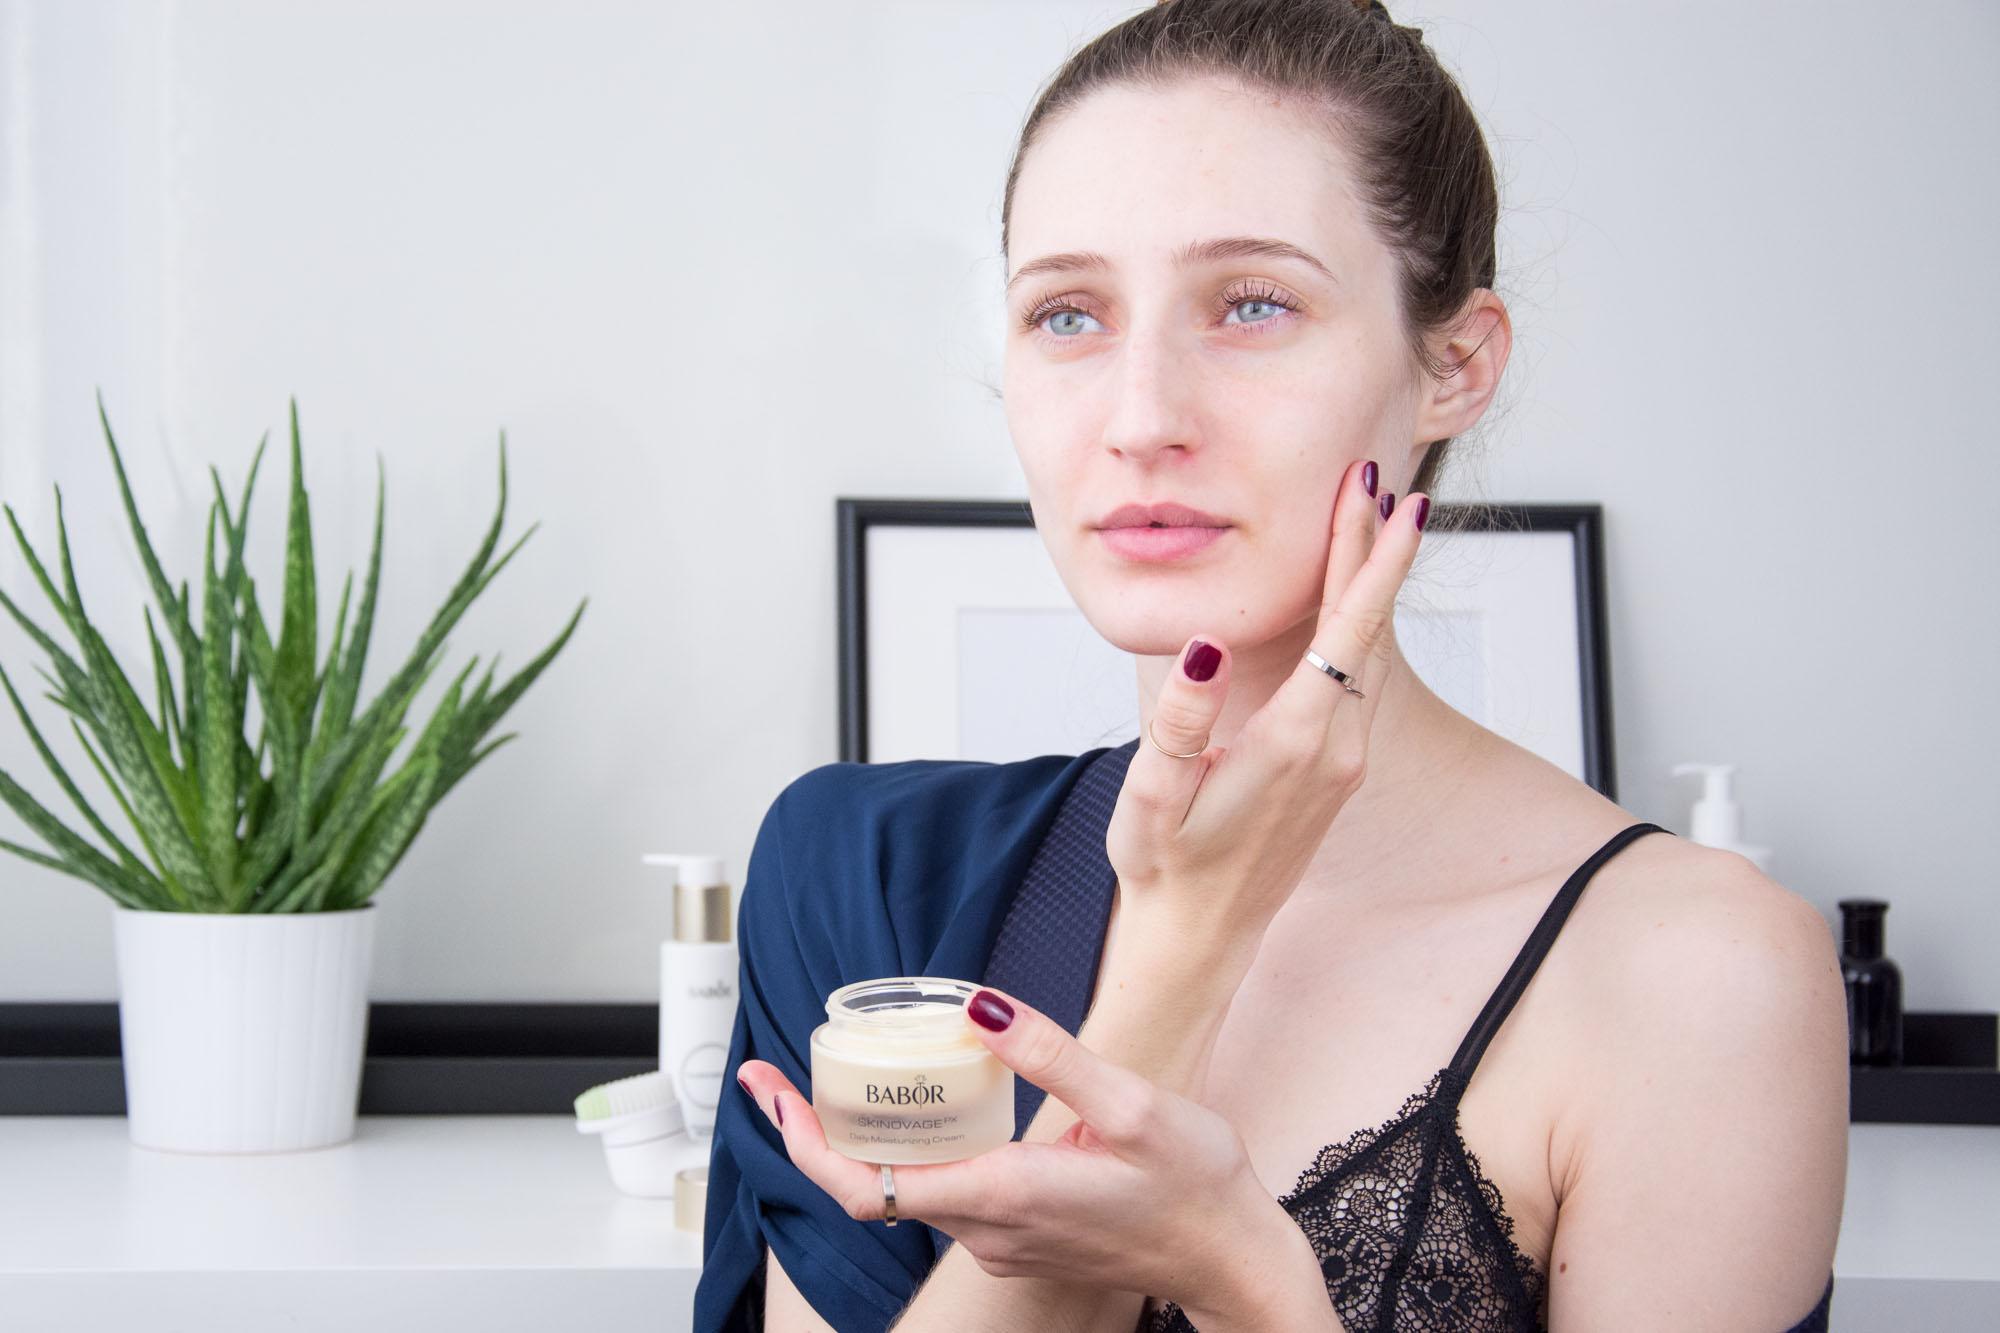 Babor Skincare / Gesichtspflege | Lisa Fiege